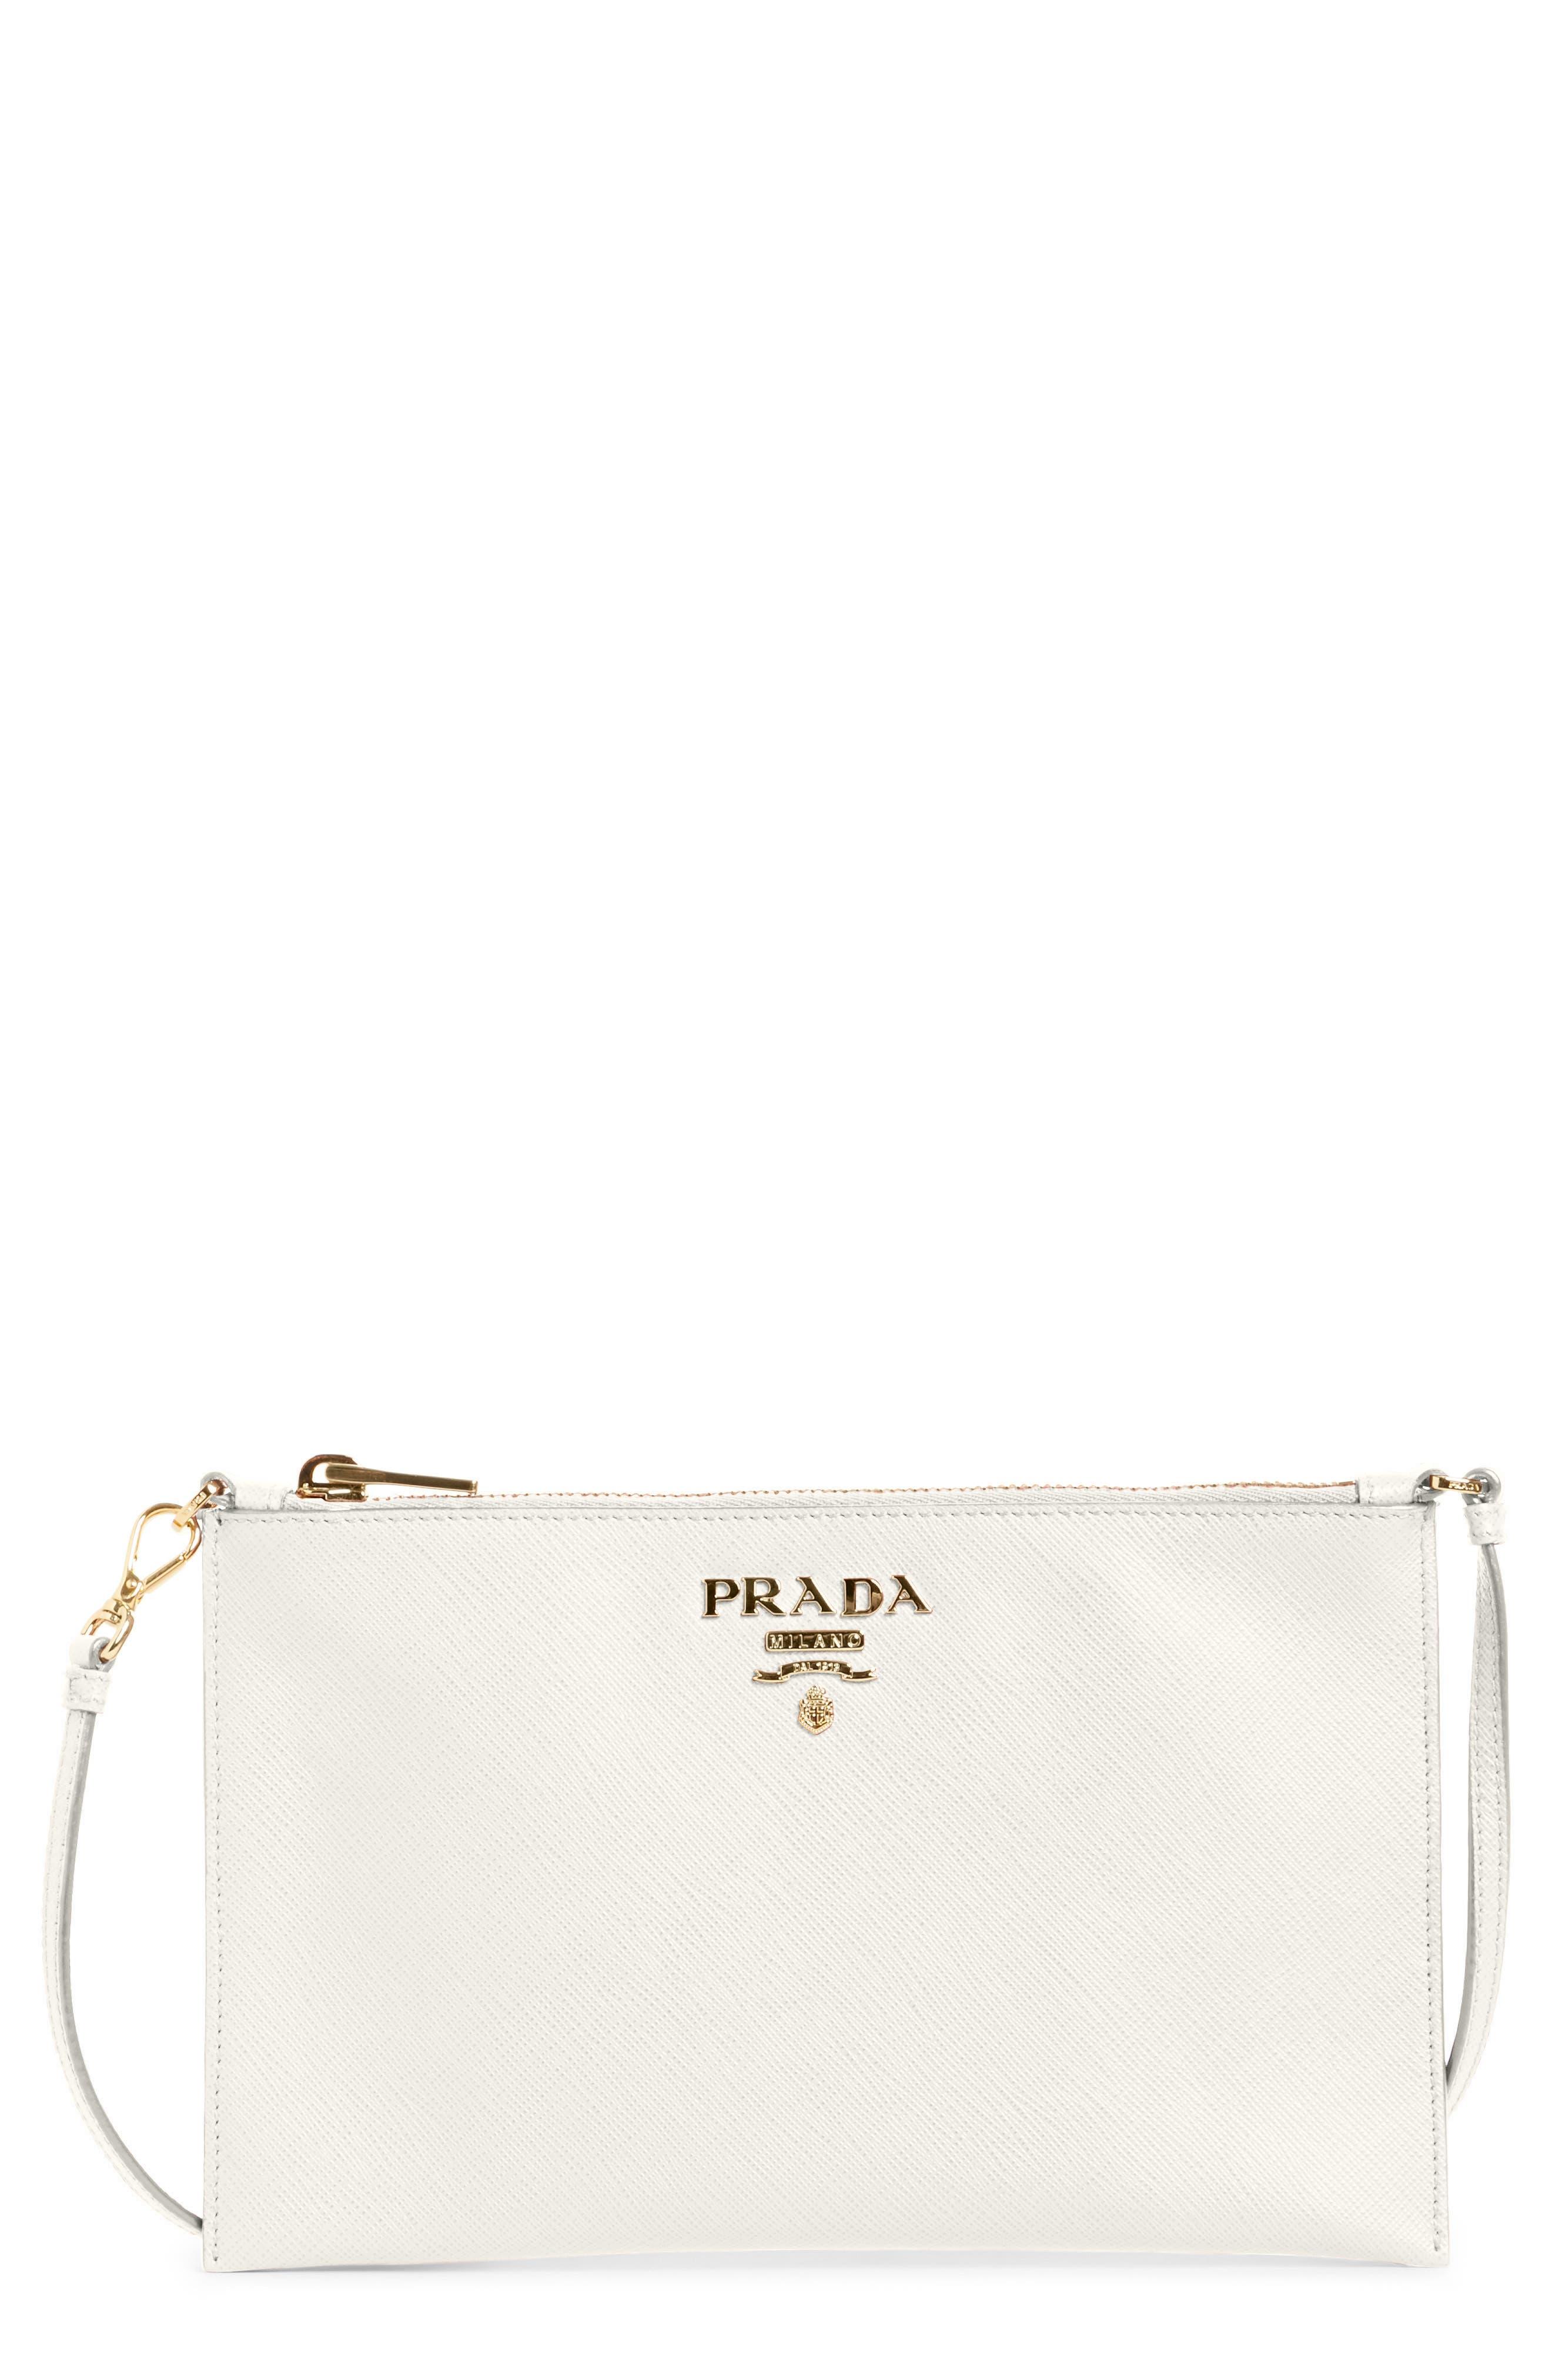 Saffiano Leather Shoulder Bag,                             Main thumbnail 1, color,                             F0009 Bianco